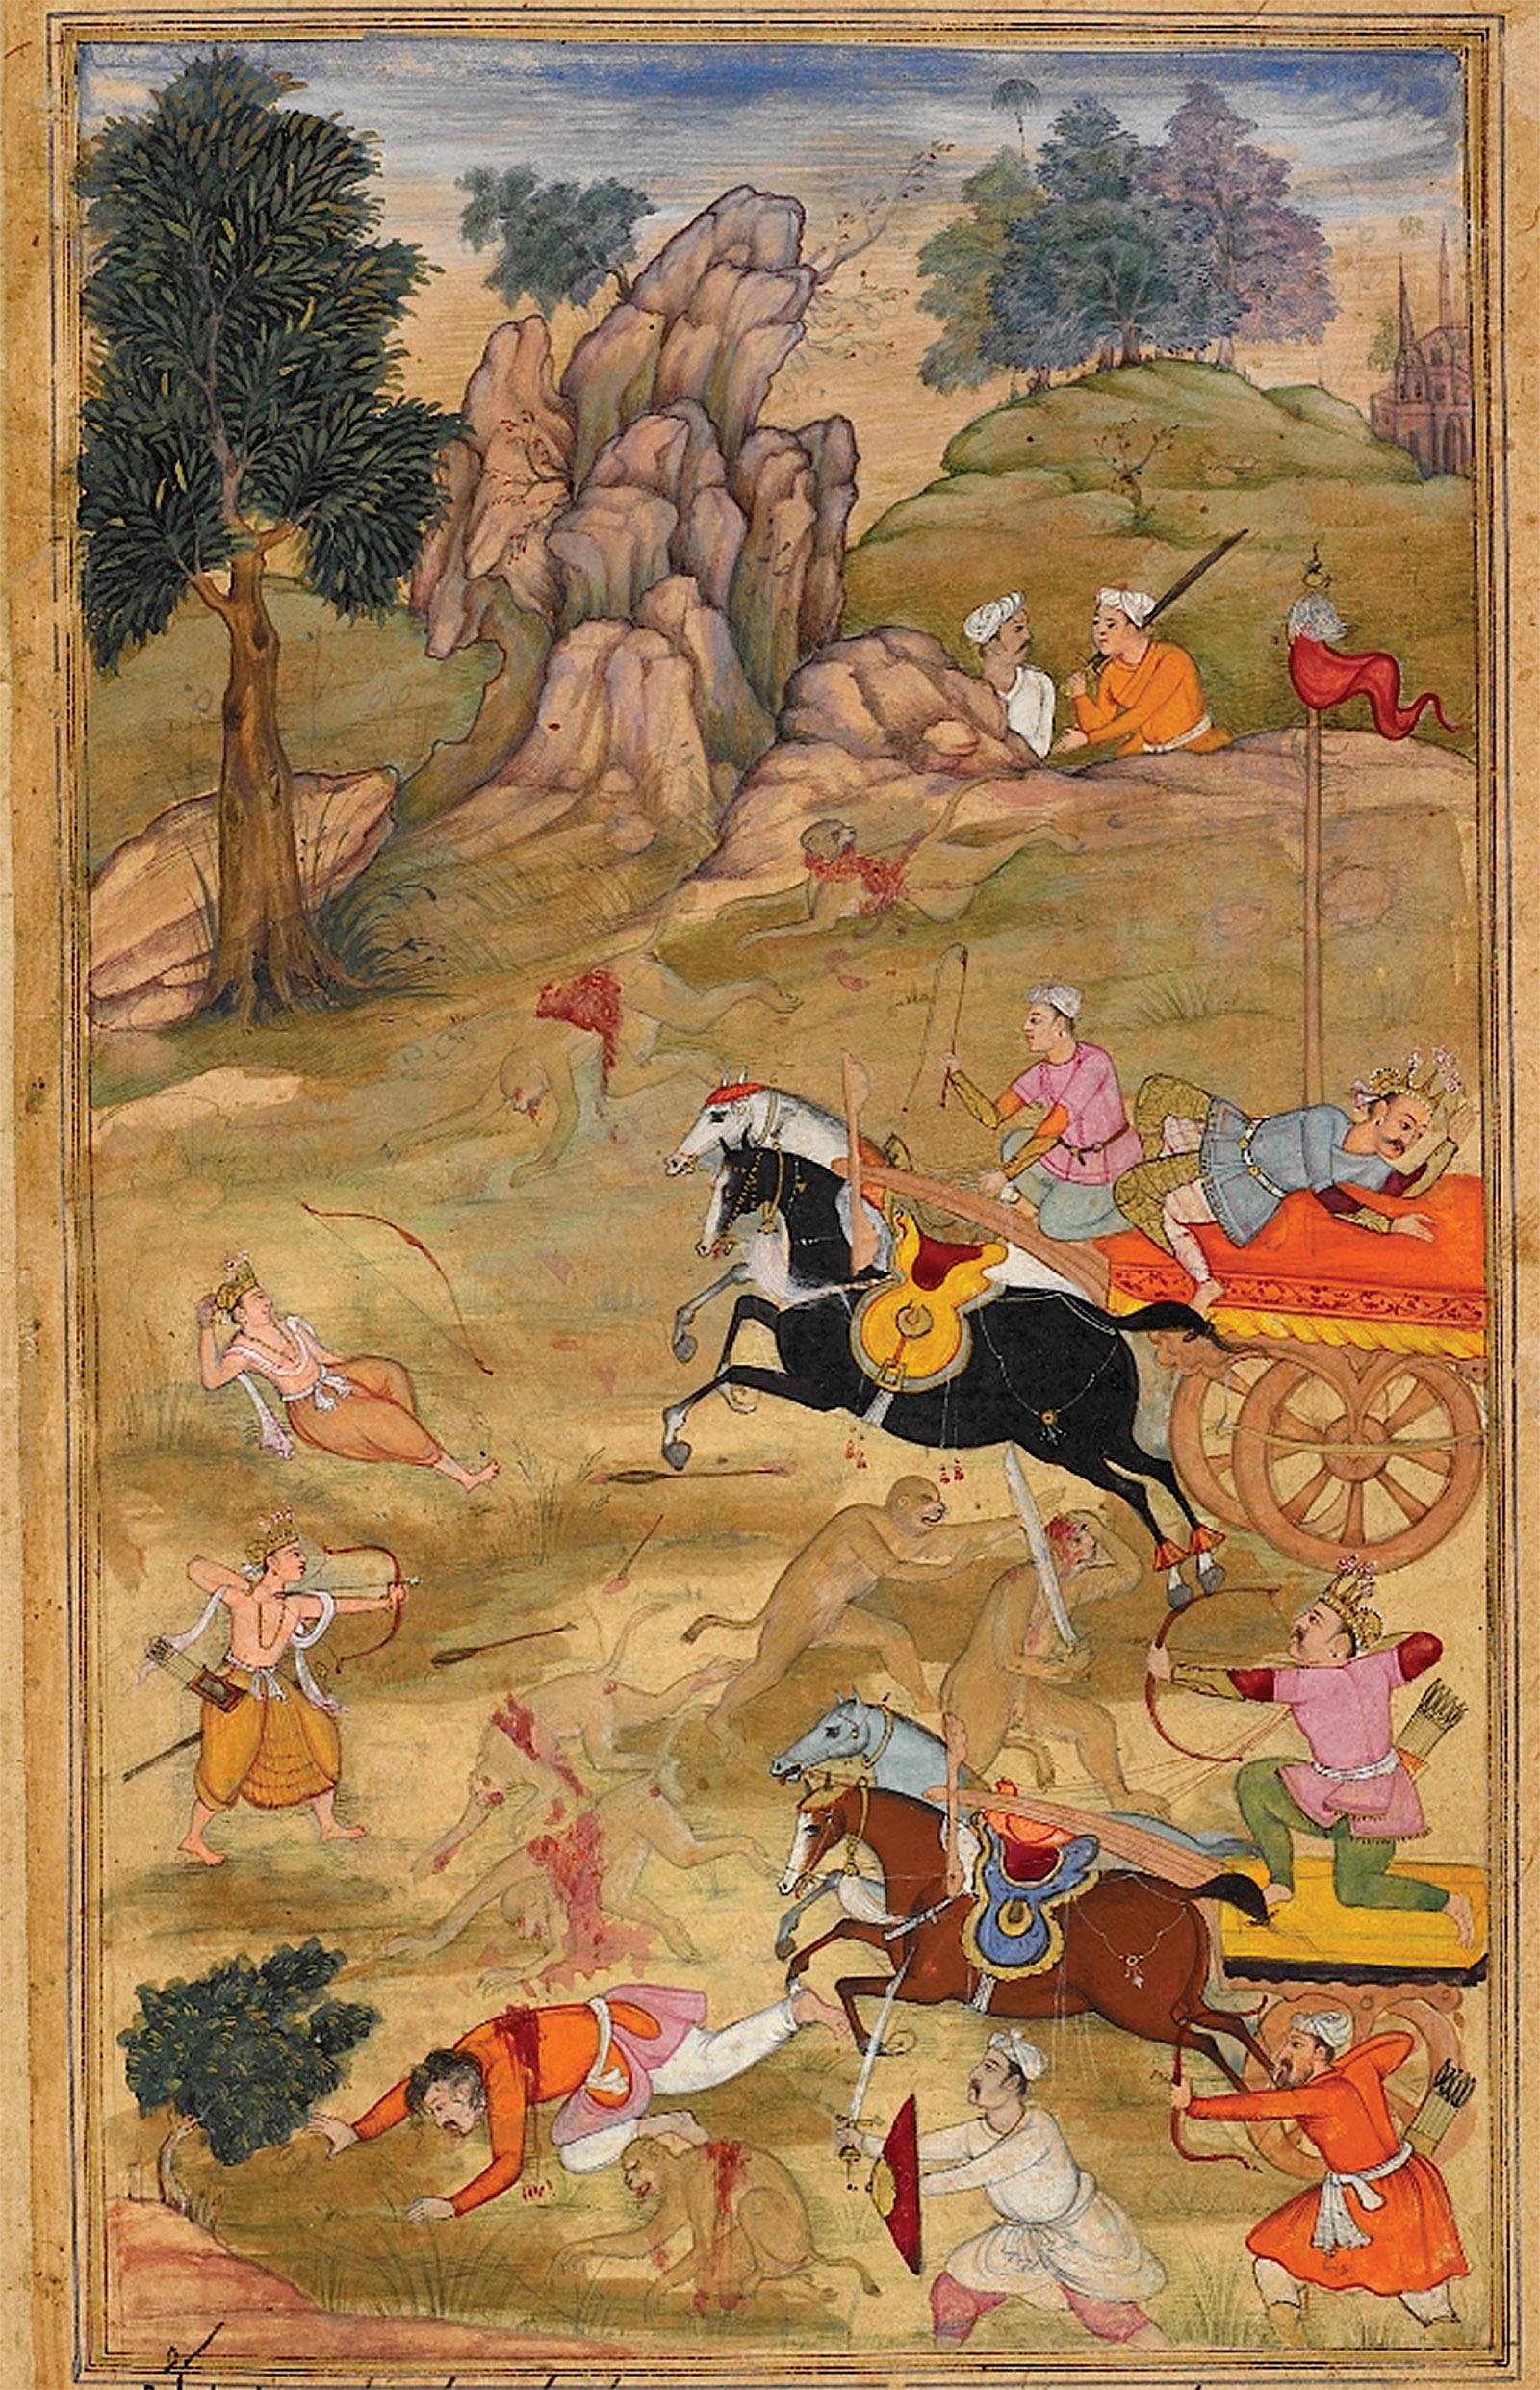 'Kusa and Lava defeating Bharata, Lakshmana, and the monkey army'; from the Razmnamah, a Persian translation of the Mahabharata, 1598